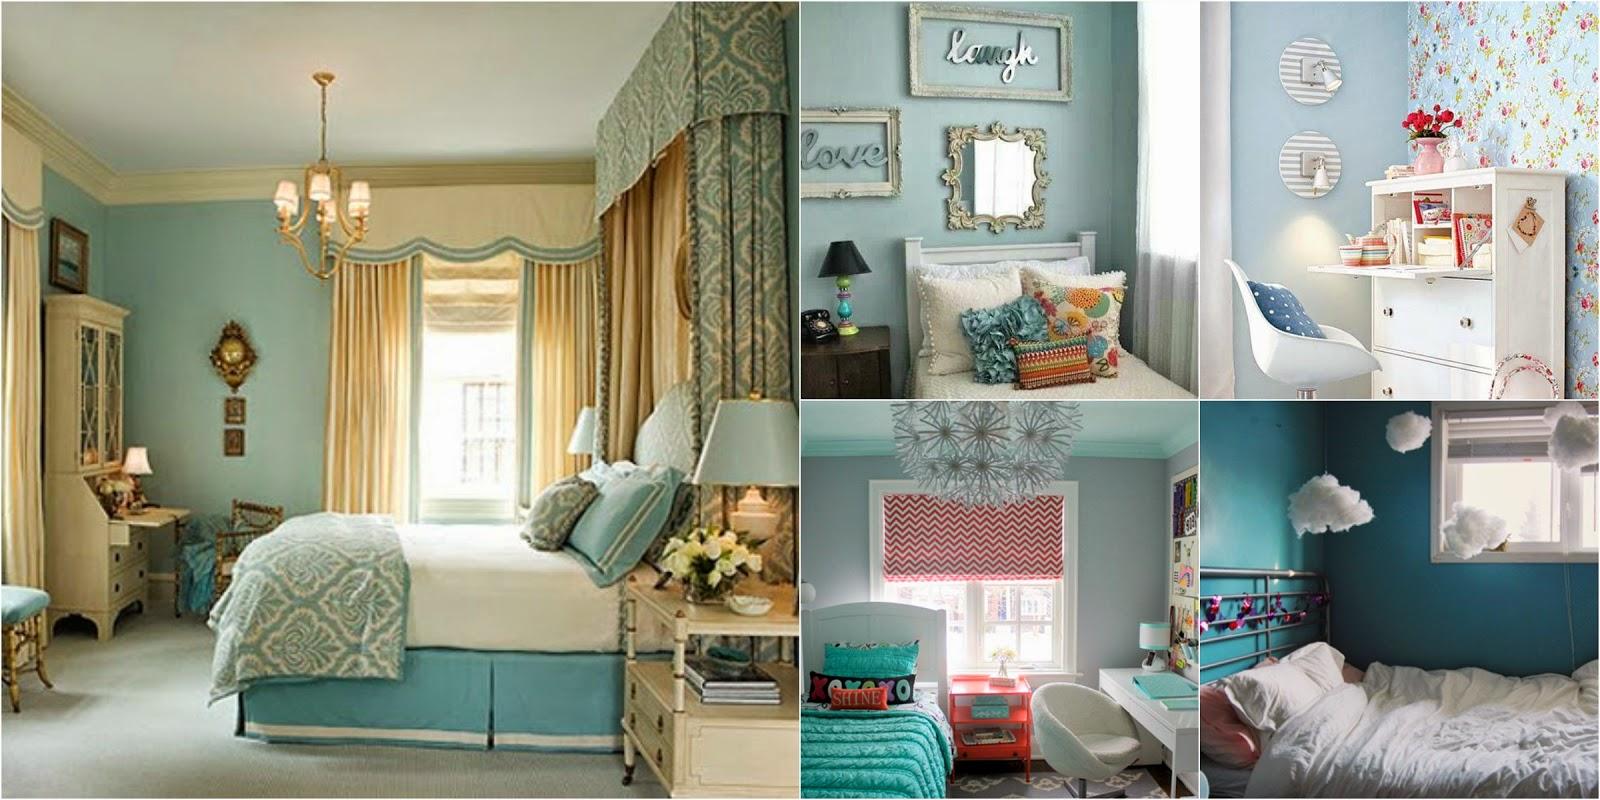 quarto azul branco e dourado